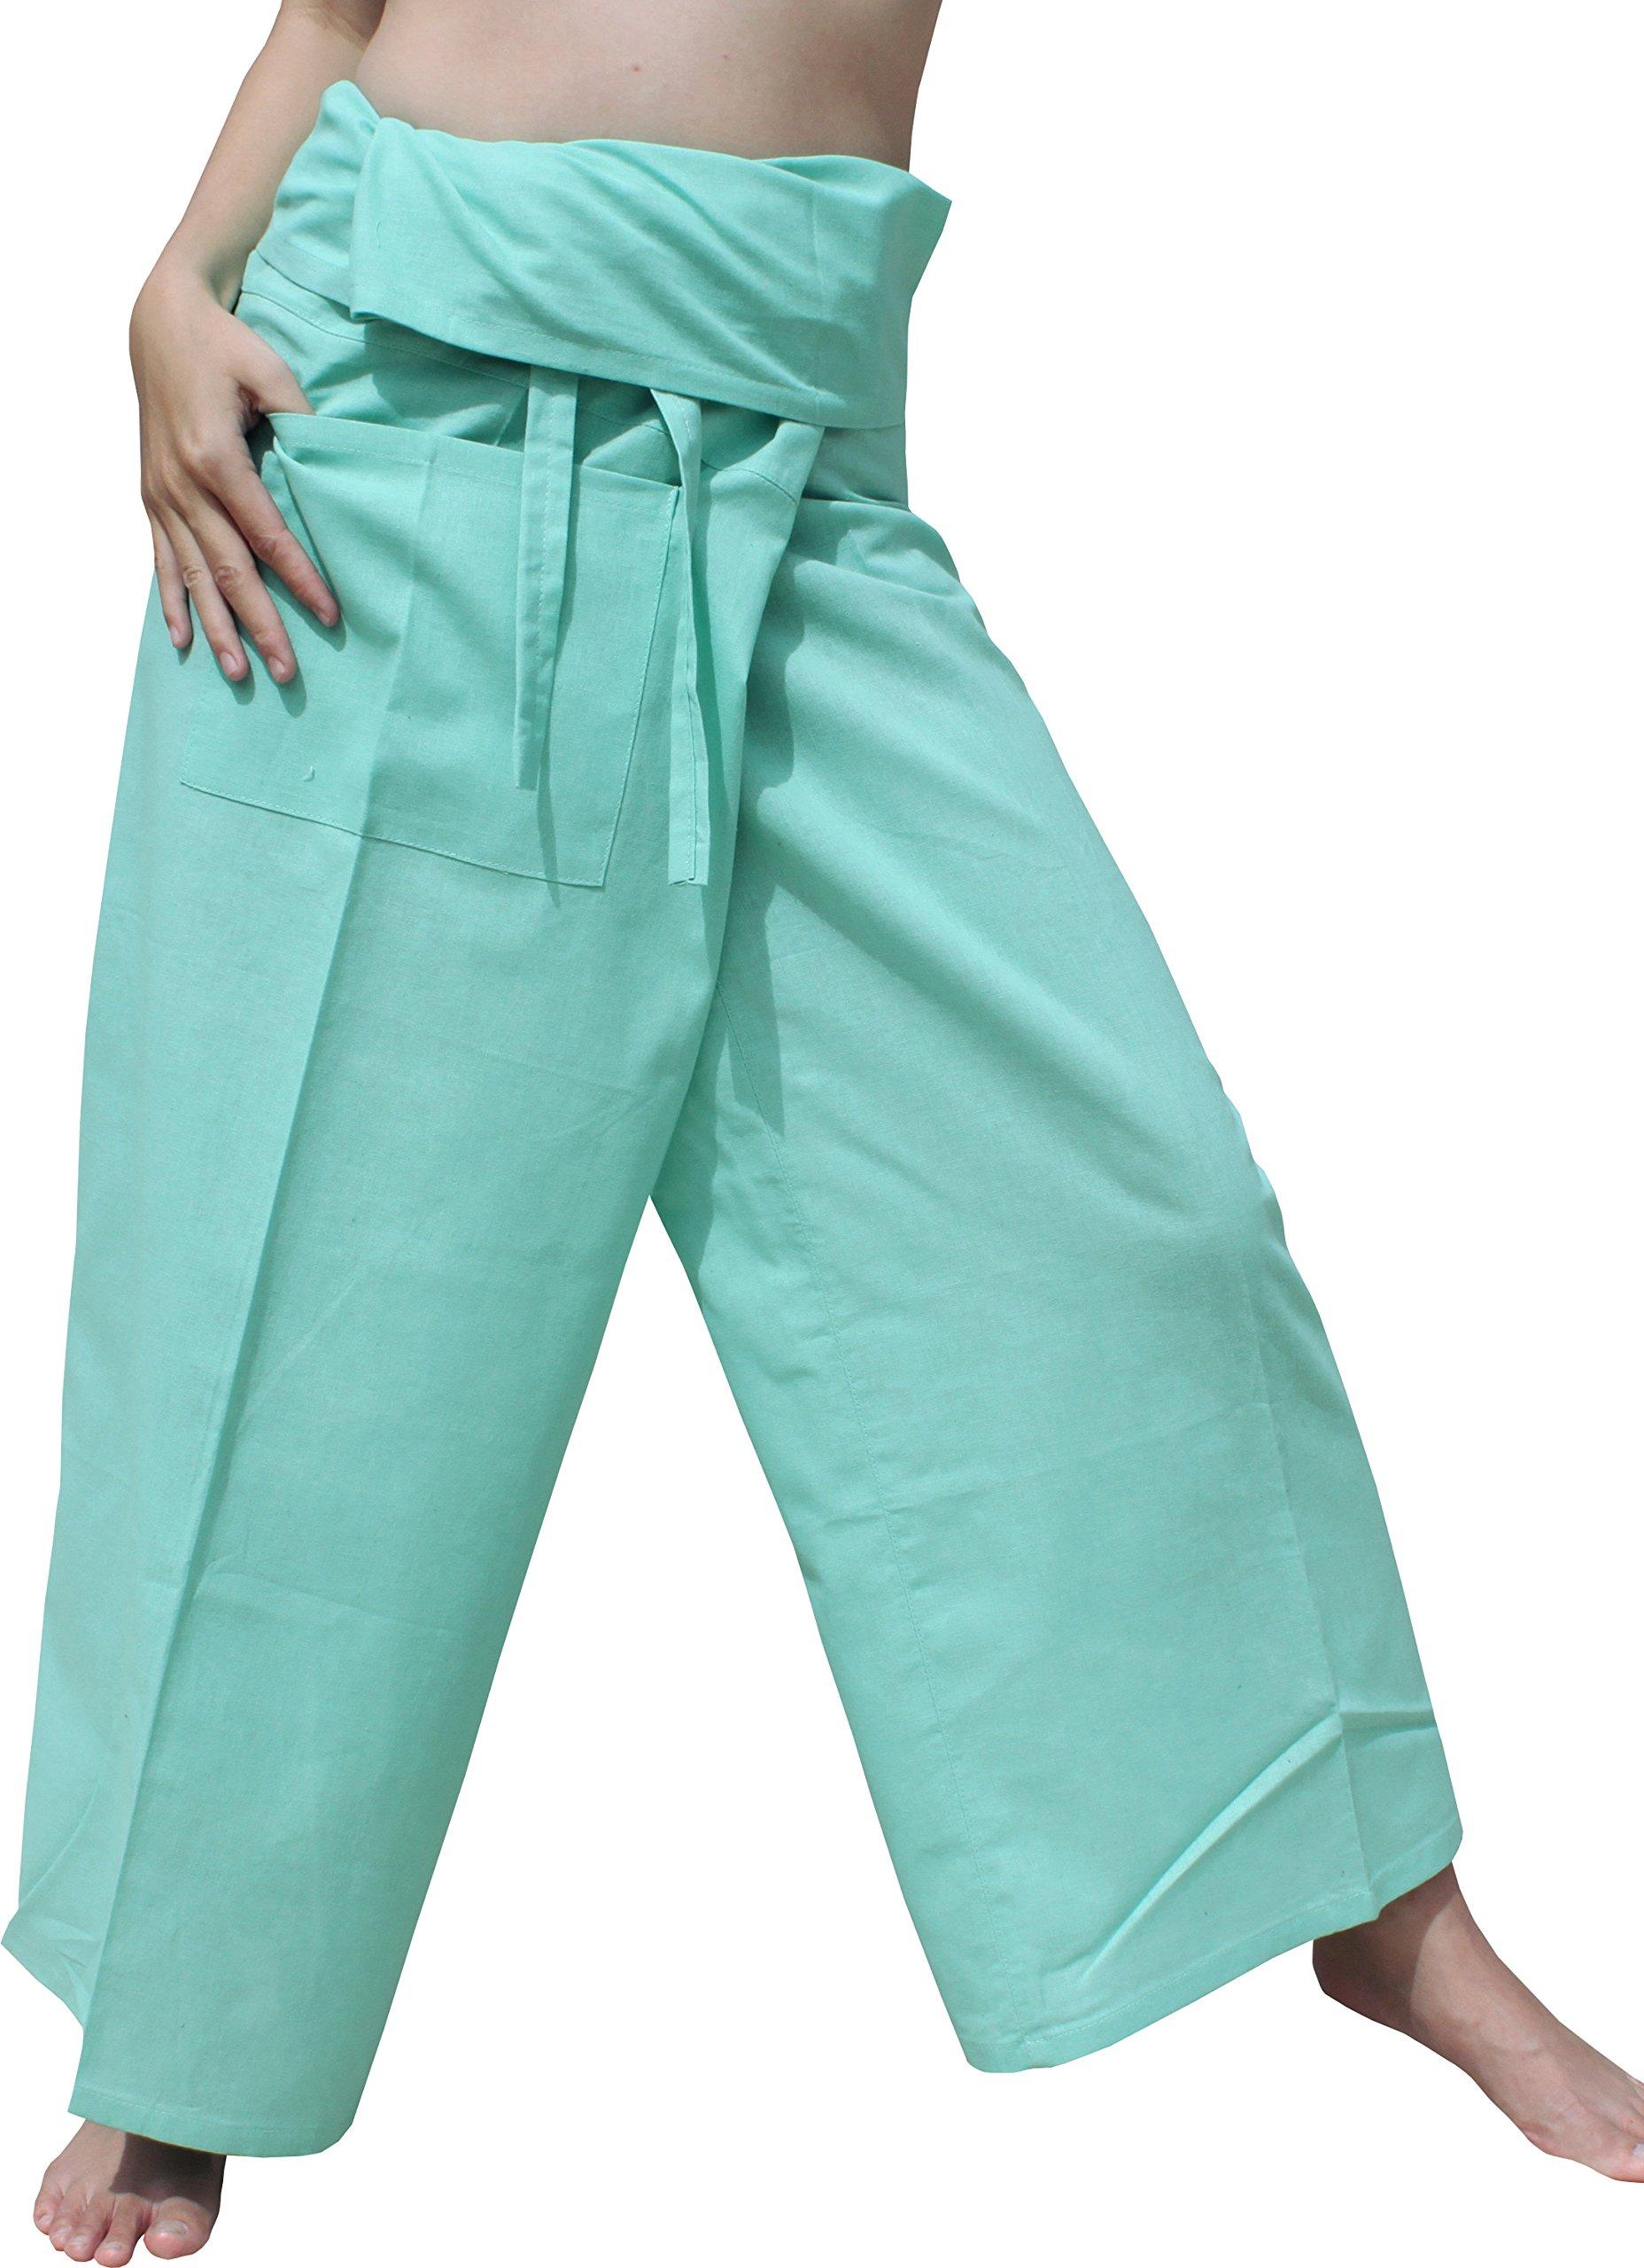 RaanPahMuang Brand Light Summer Cotton Thai Plus Fisherman Wrap Pants, XX-Large, Magic Mint Green by RaanPahMuang